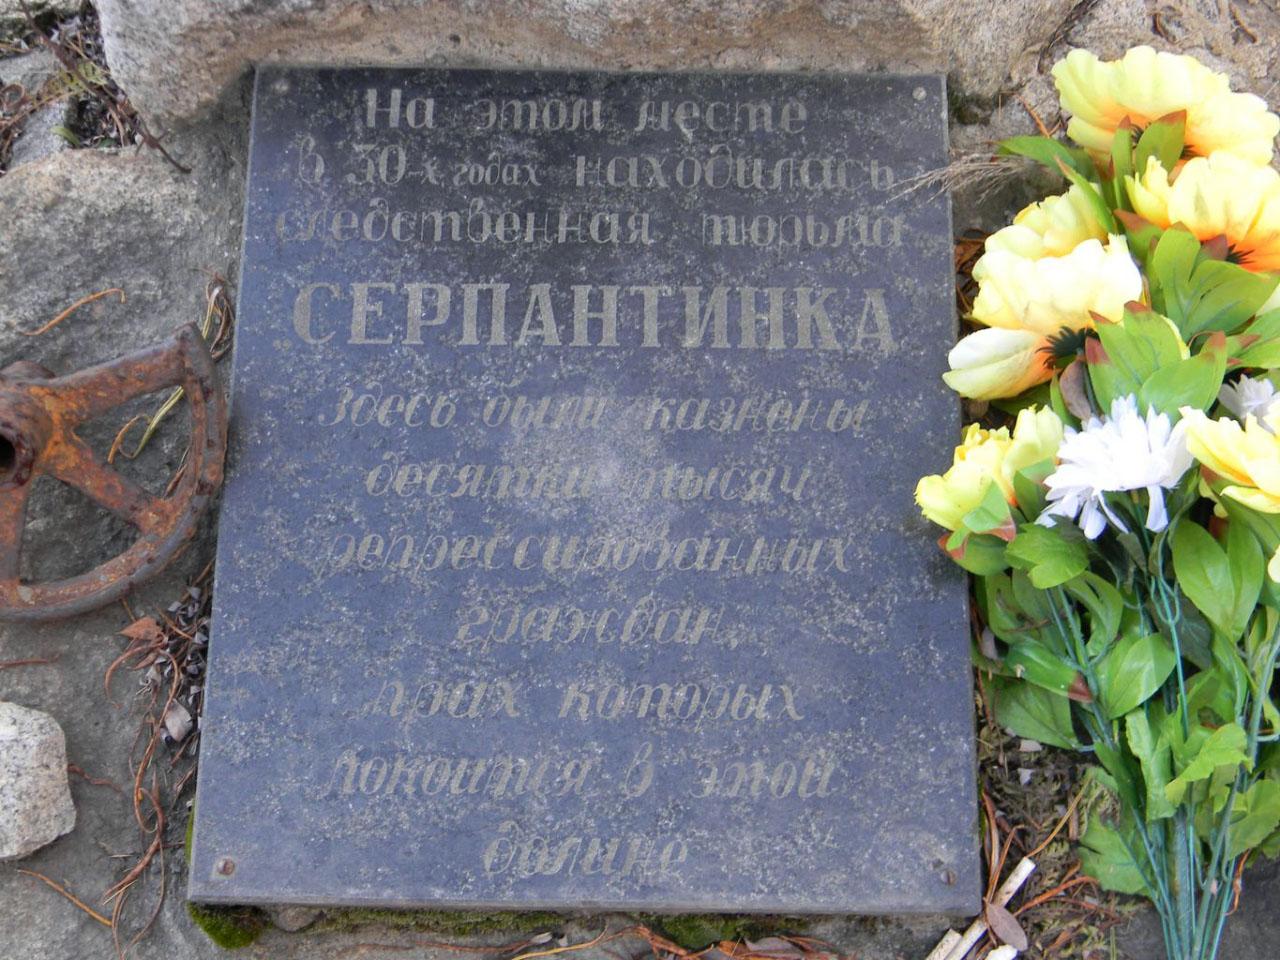 Табличка на памятнике у Серпантинке - расстрельном лагере Гулага